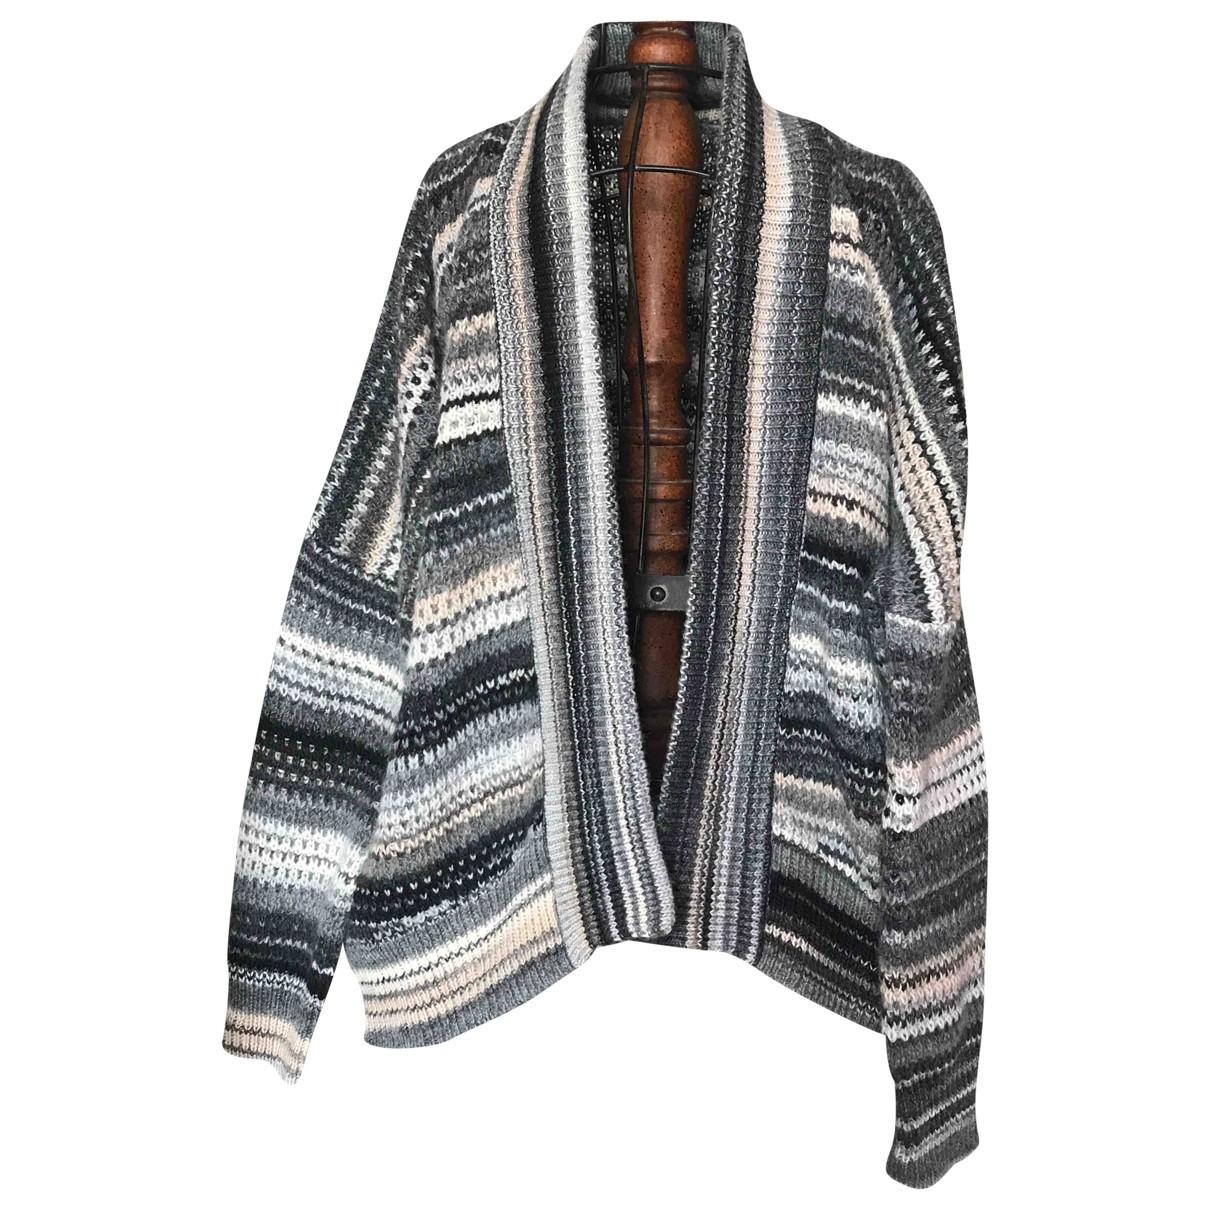 Zadig & Voltaire Fall Winter 2019 Grey Wool Knitwear for Women S International